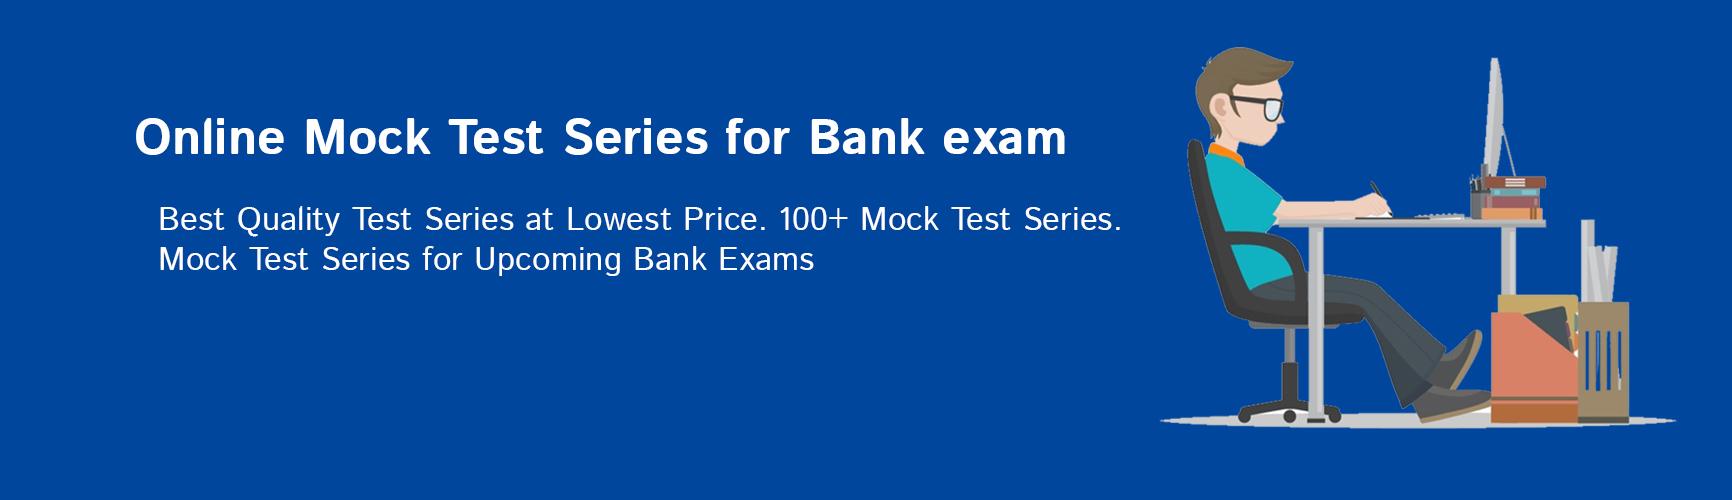 Online Mock Test Series For Bank Exams Free Mock Tests For Bank Po Ibps Po Ibps Rrb Sbi Po Ibps Chennai India